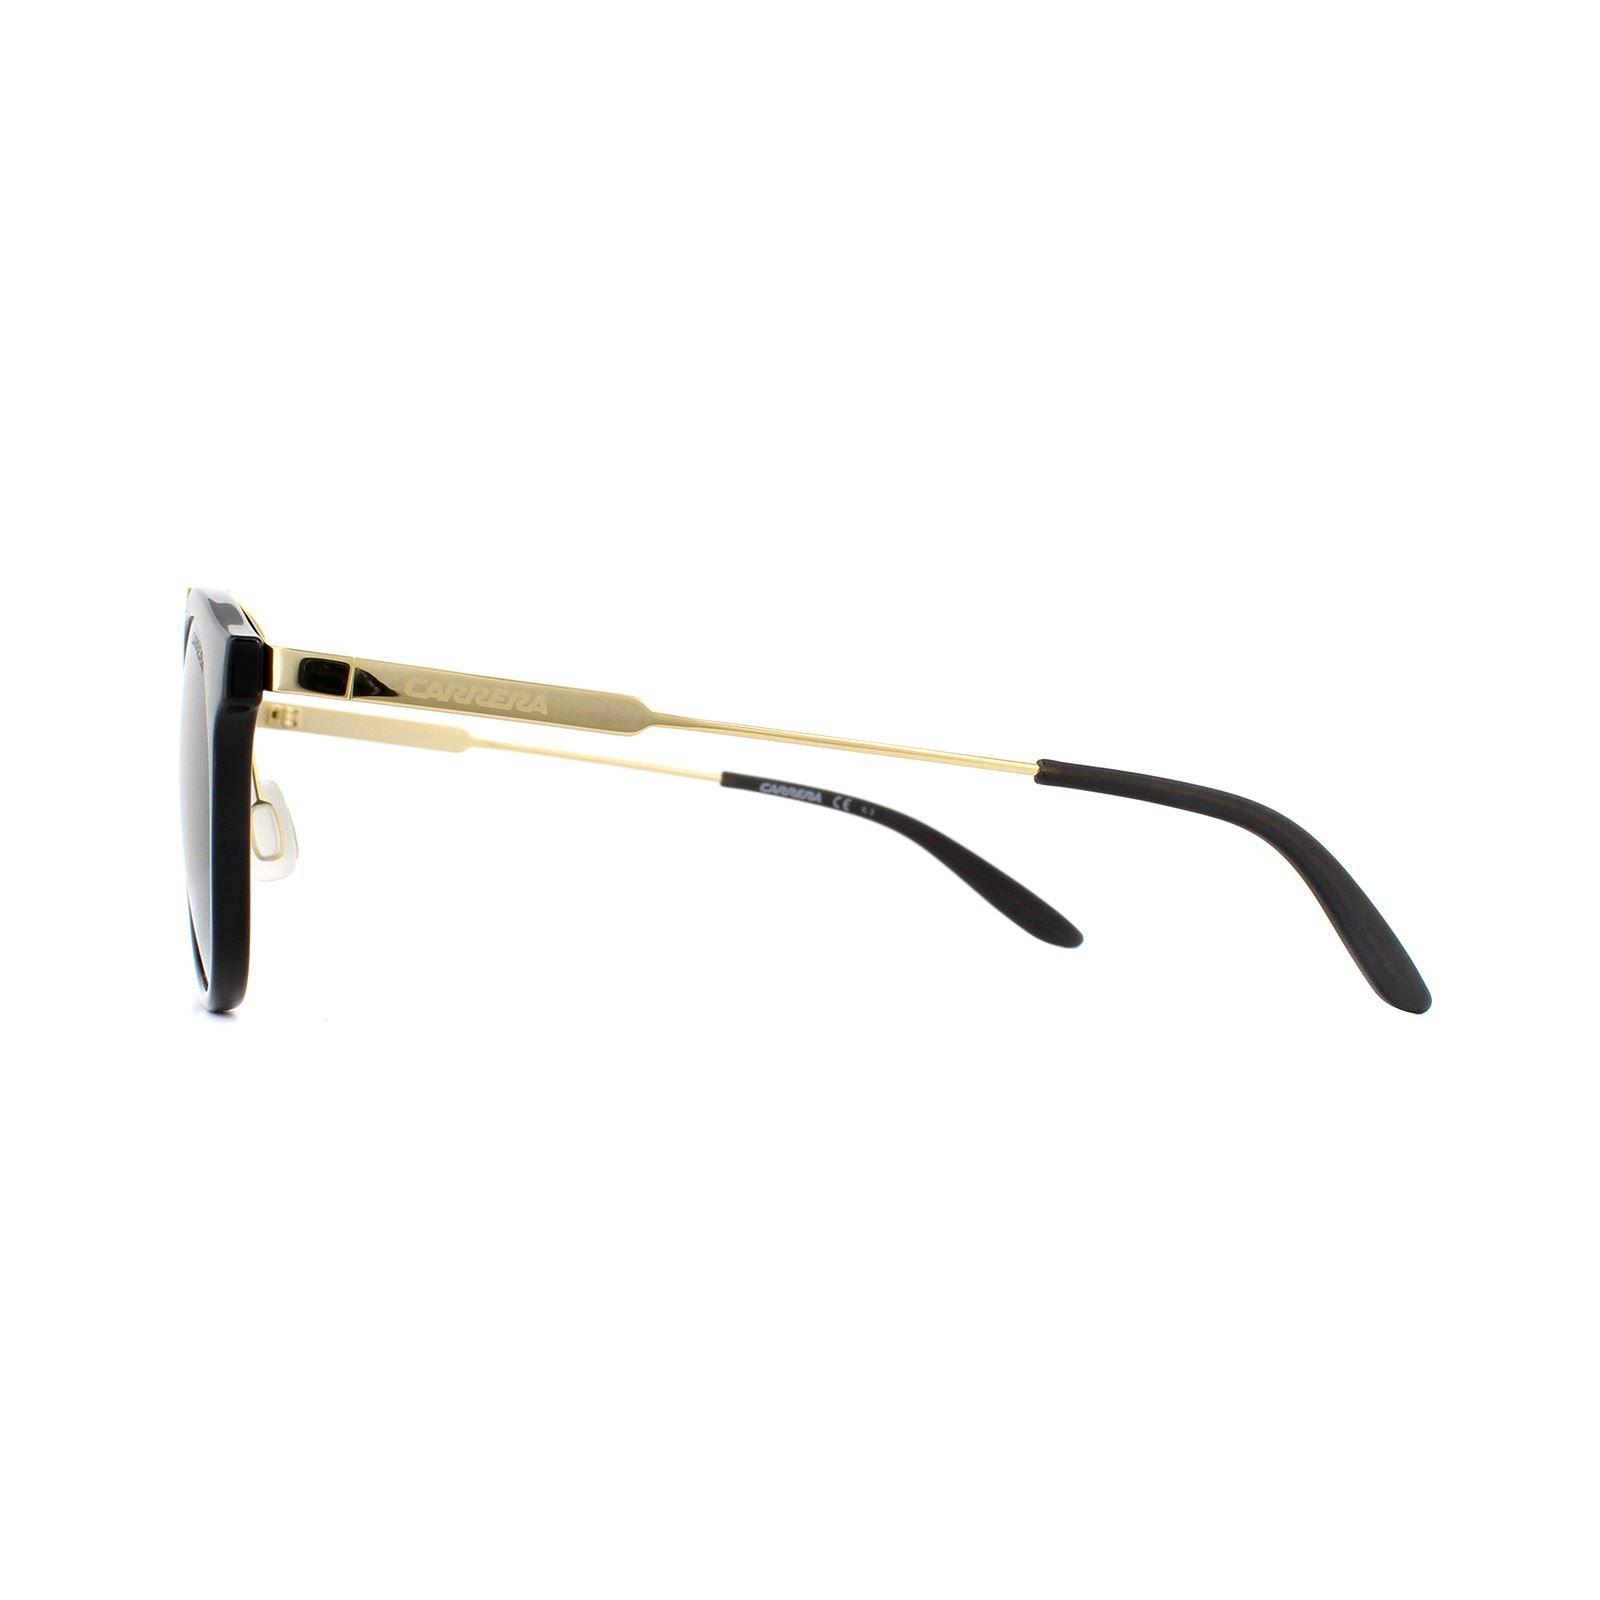 Carrera Sunglasses 126/S 6UB NR Shiny Black Gold Brown Grey